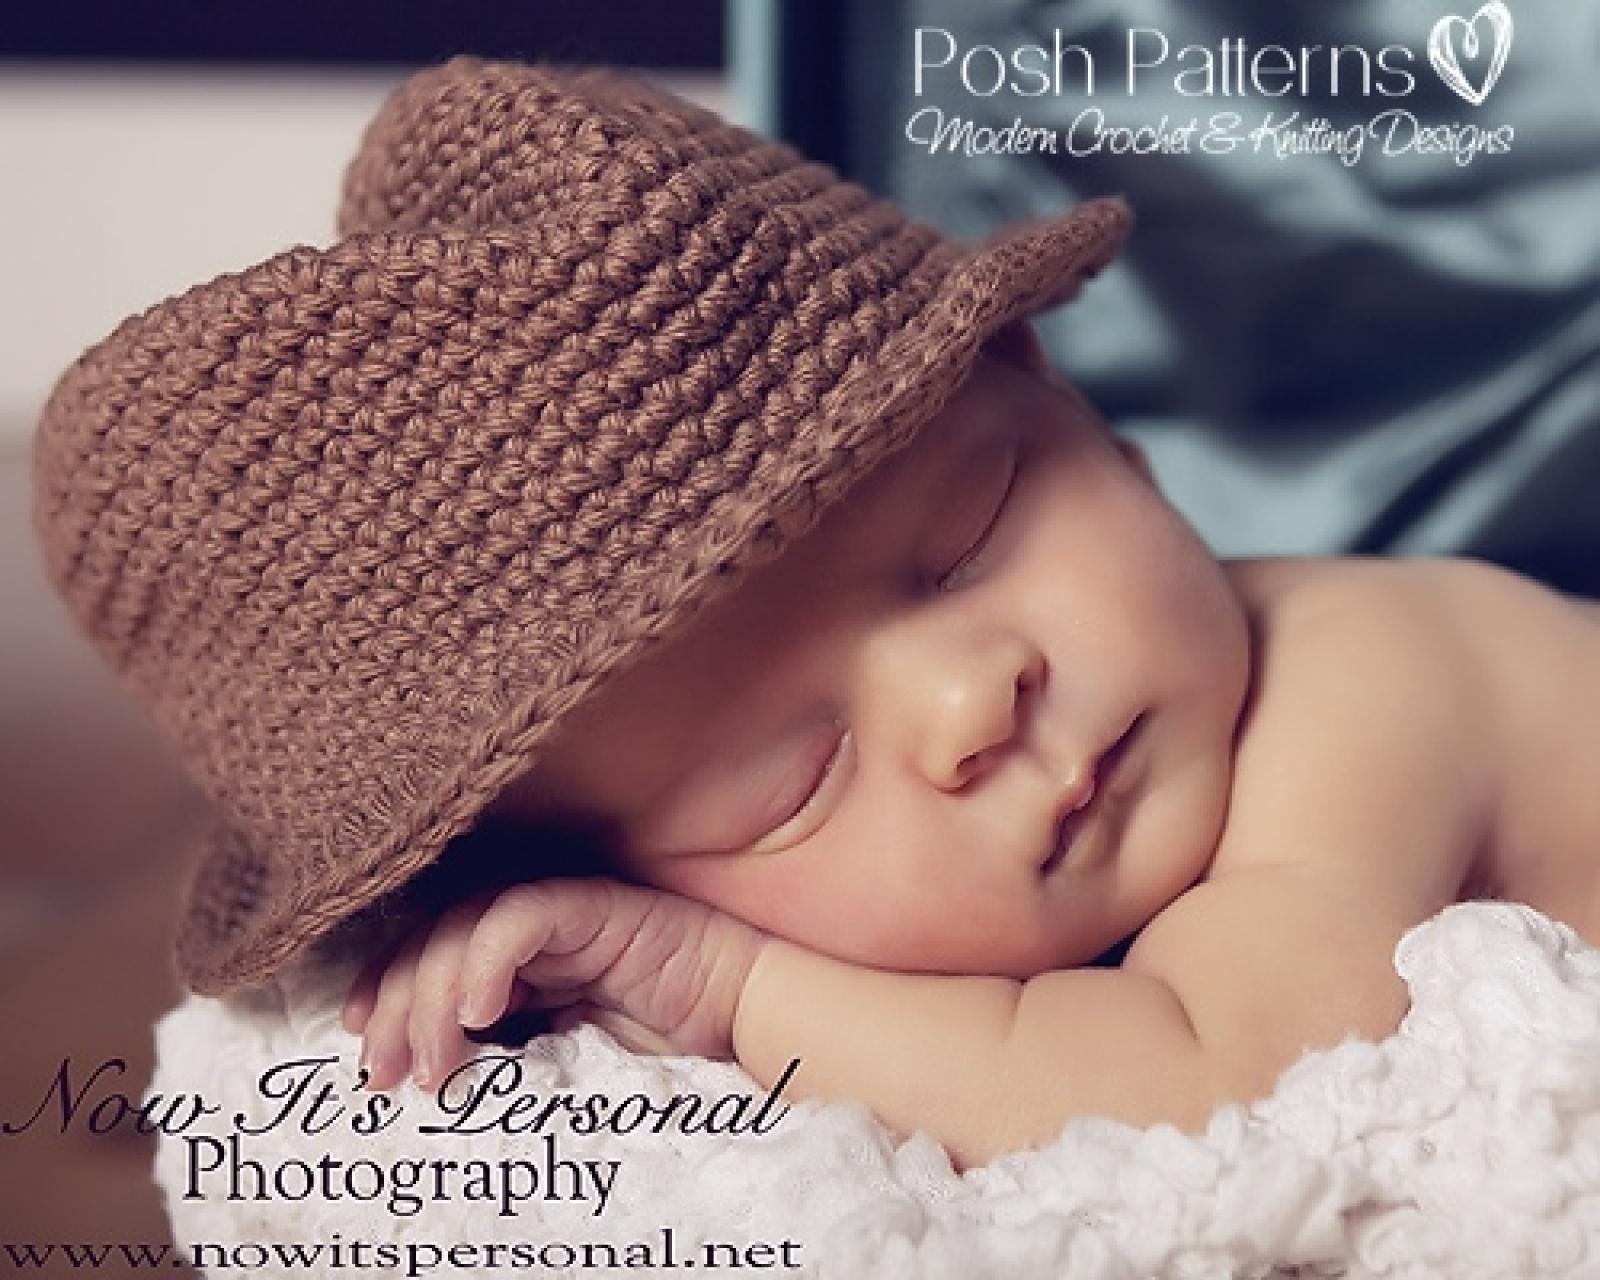 Fedora Hat Crochet Pattern | Crochet Cowboy Hat